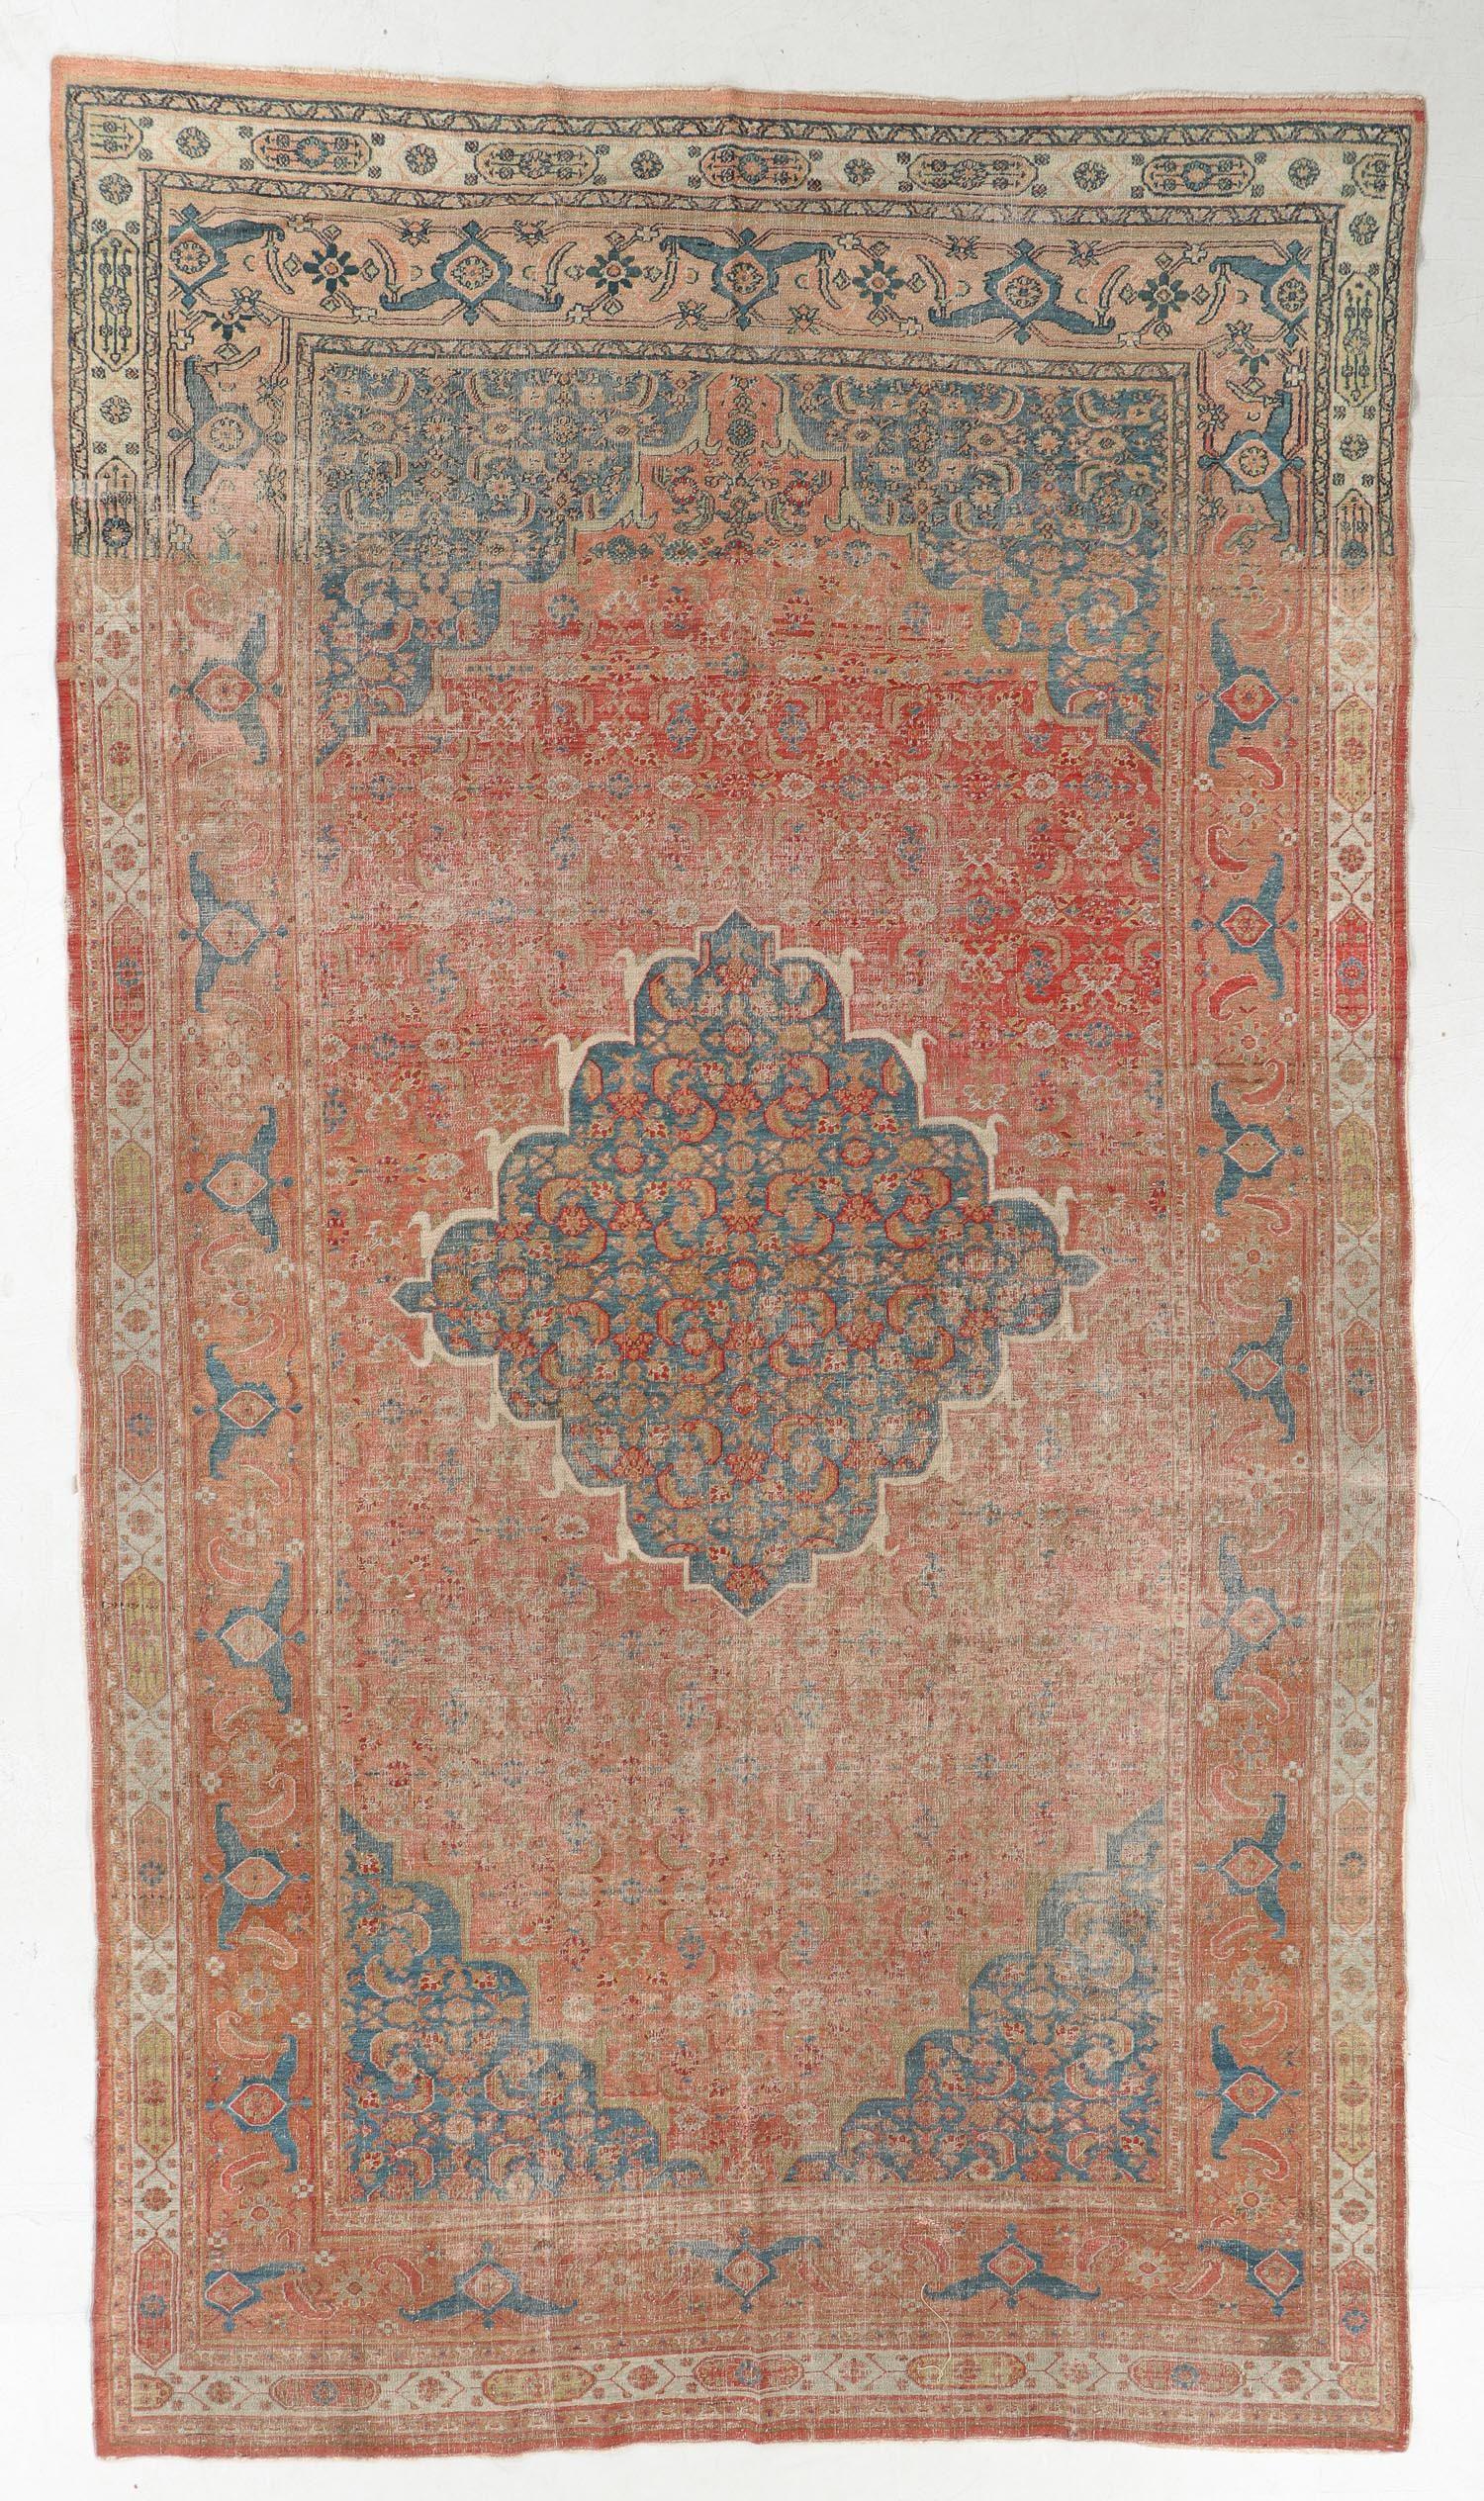 Dorokhsh Rug, Persia, Late 19th C., 6'3'' x 11'2''